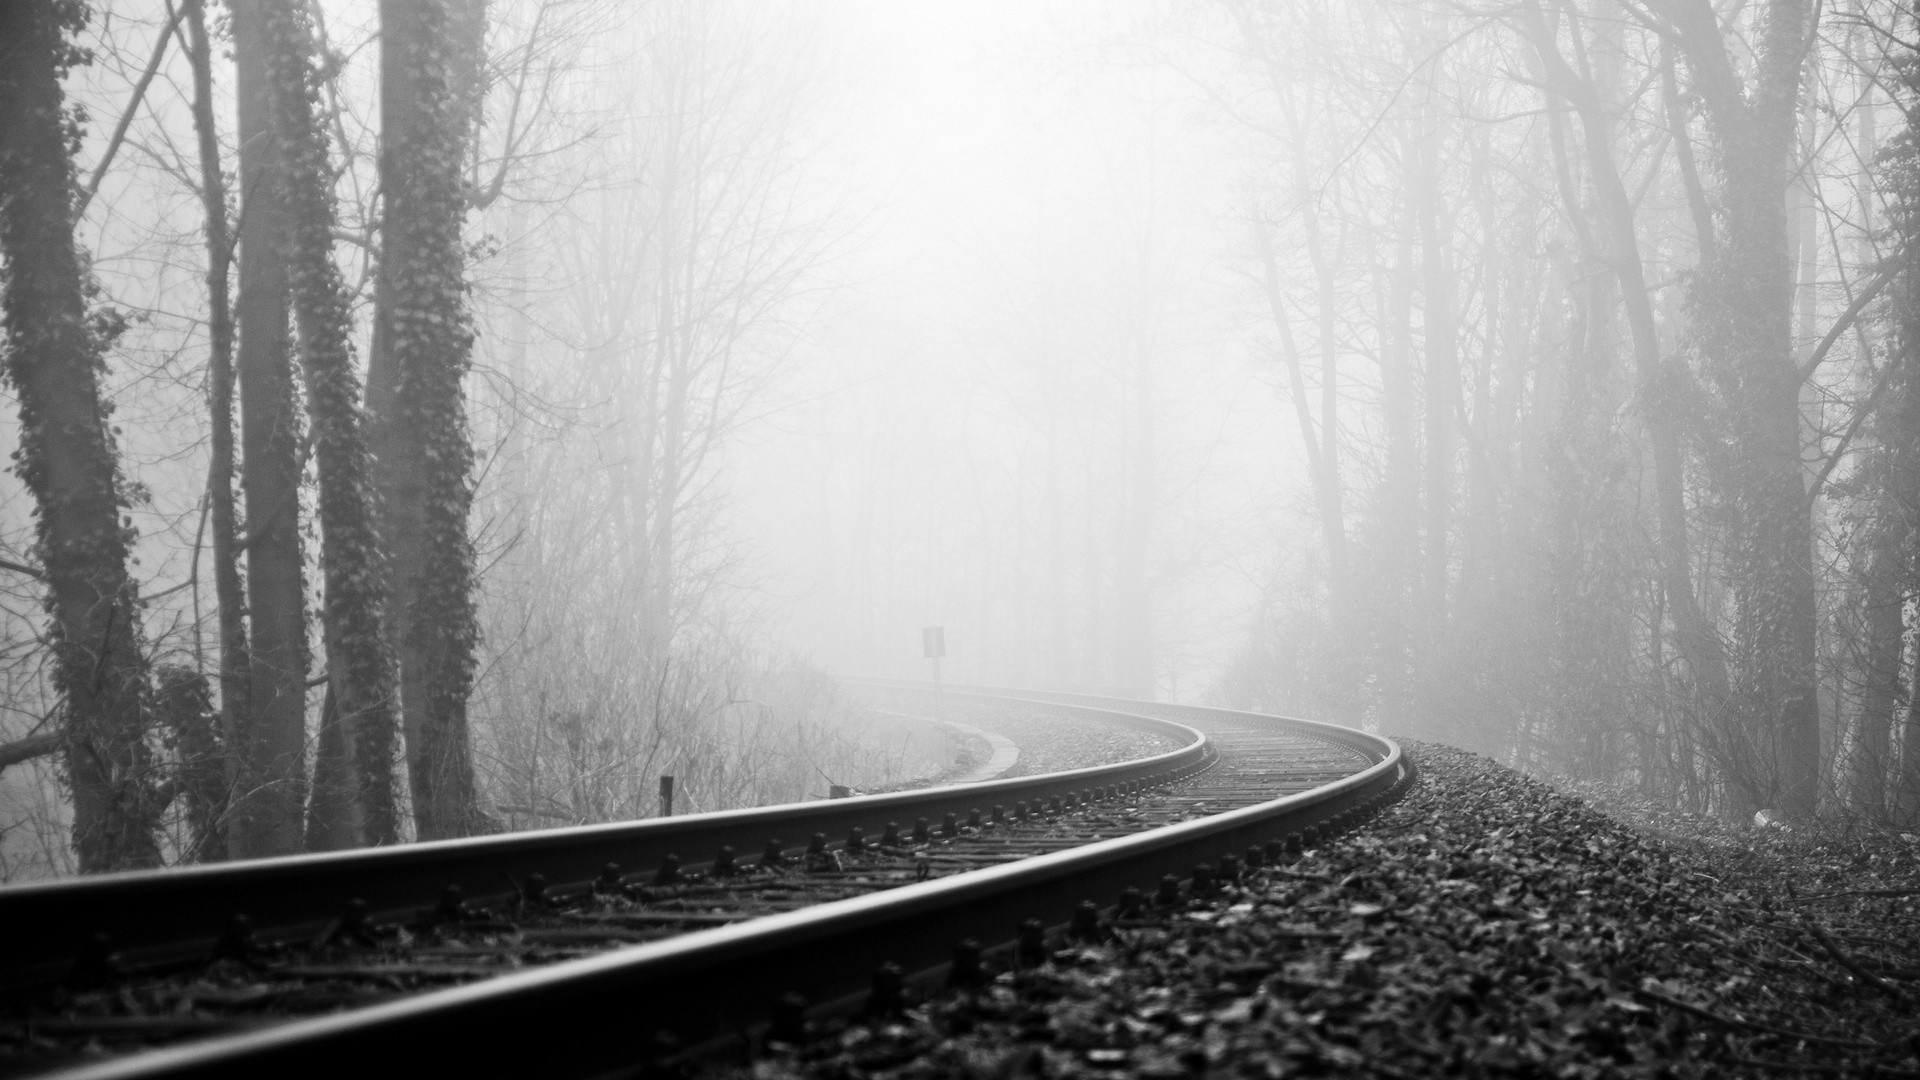 Vehicles train tracks railroad black white trees forest fog haze .